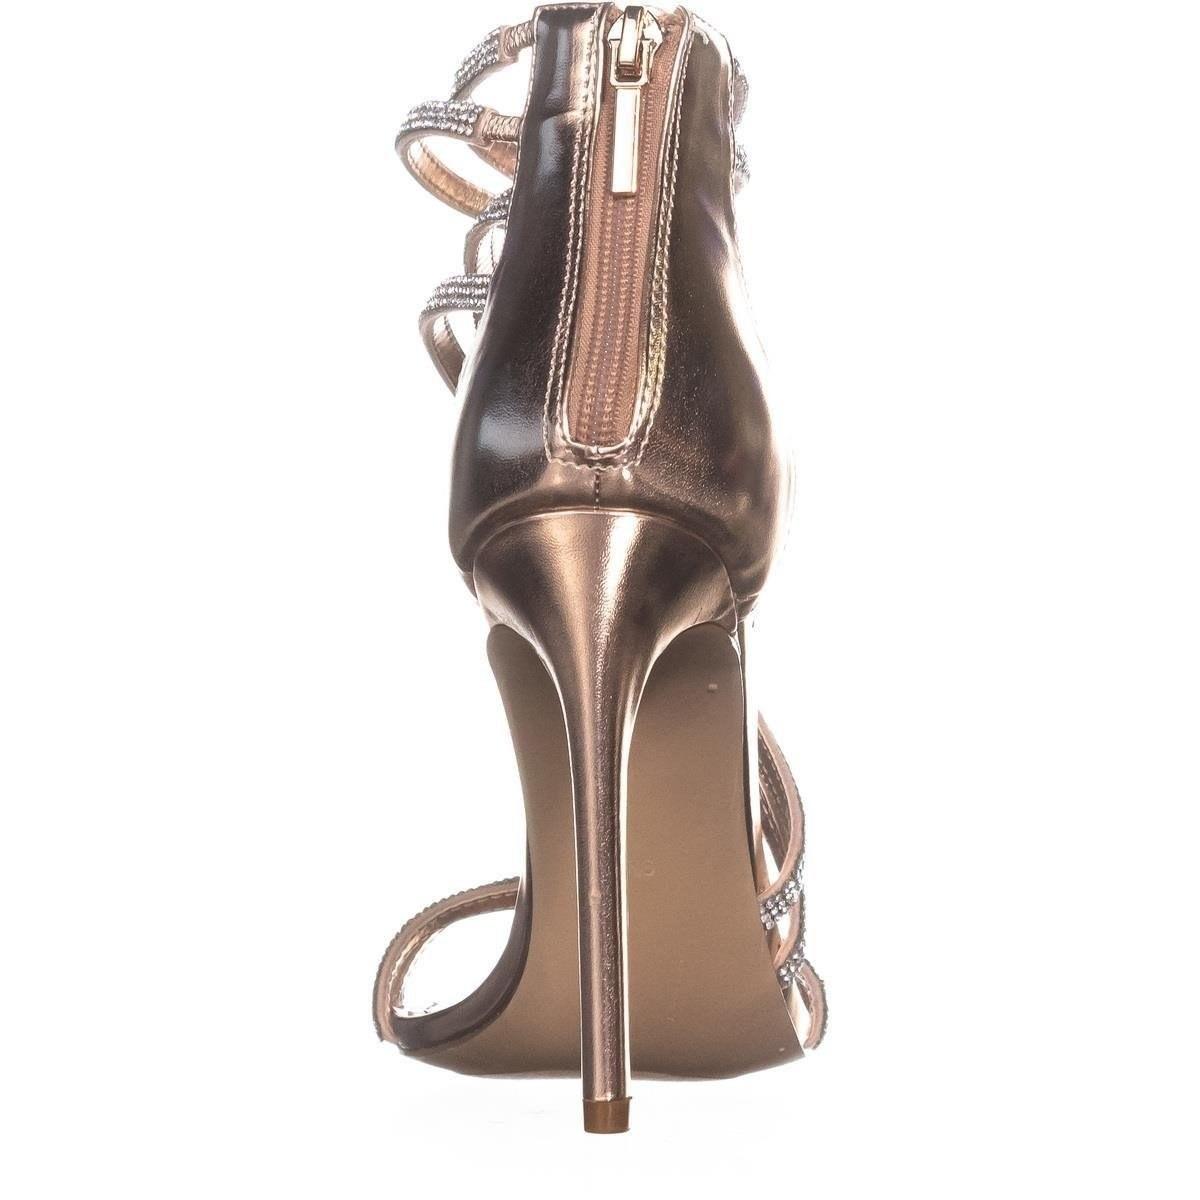 f6620493298 Cargando zoom... zapatos zapatillas tacones steve madden sweetest rose gold